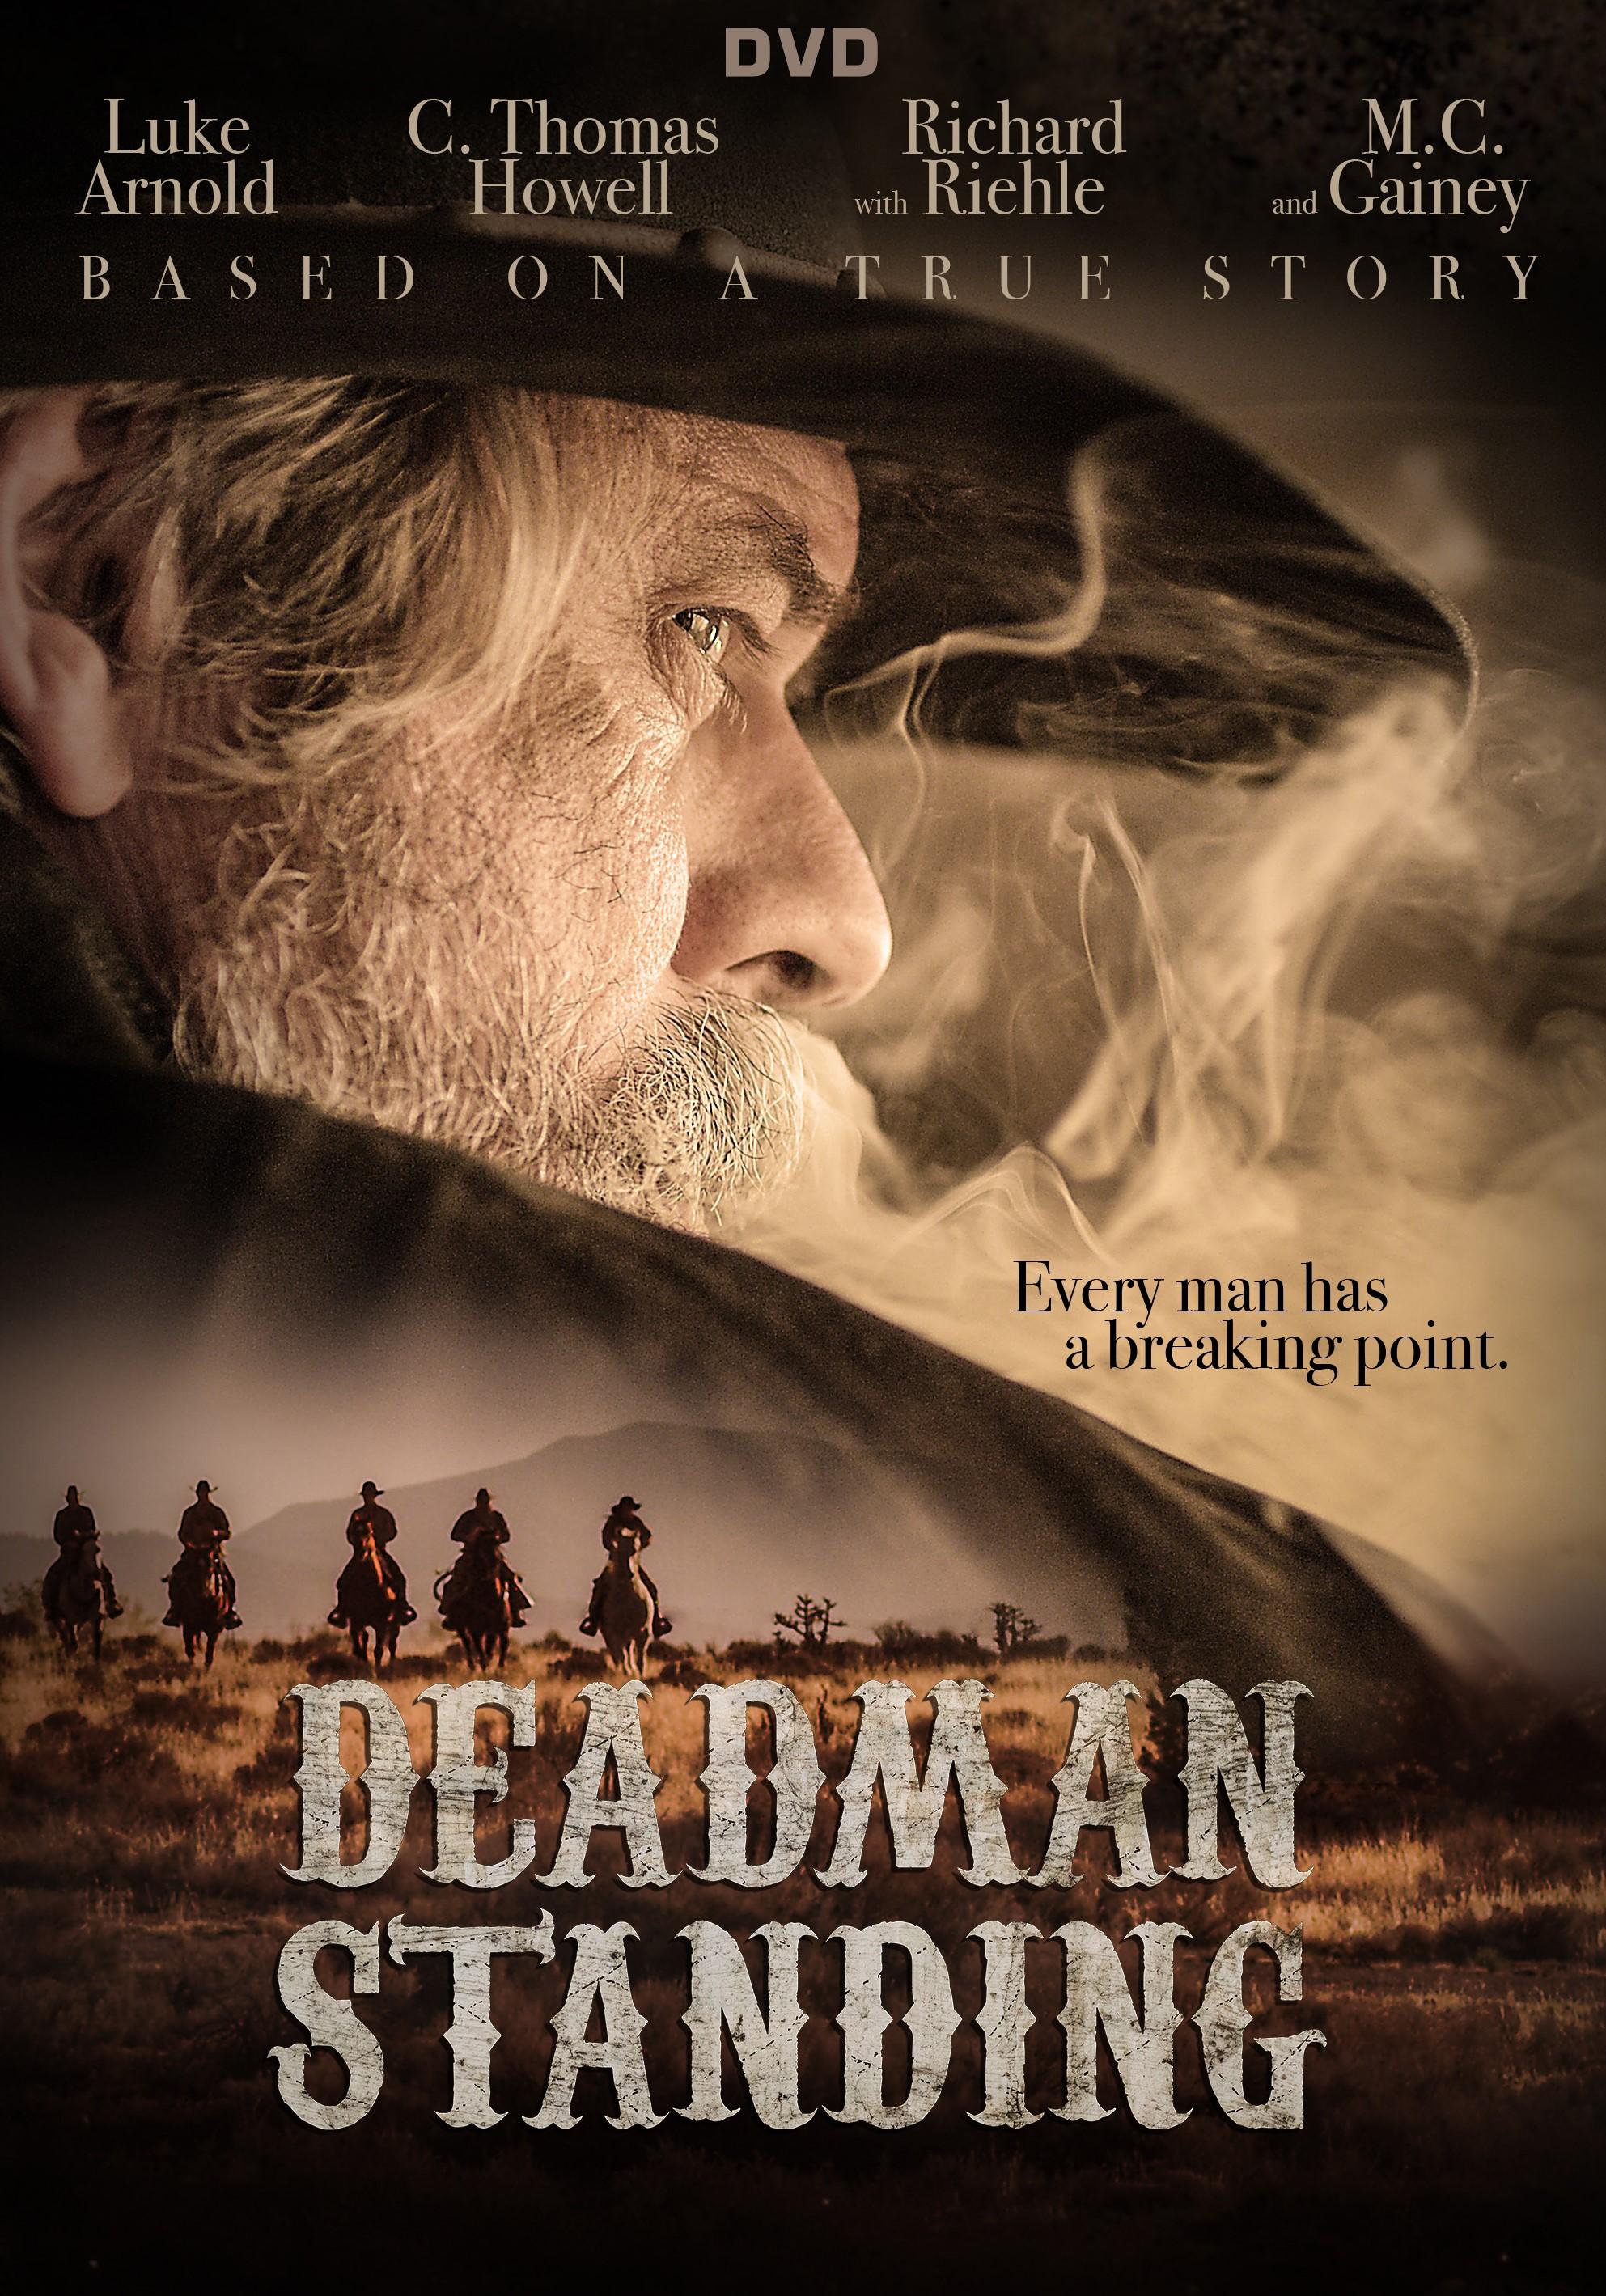 Deadman Standing (2018) - IMDb